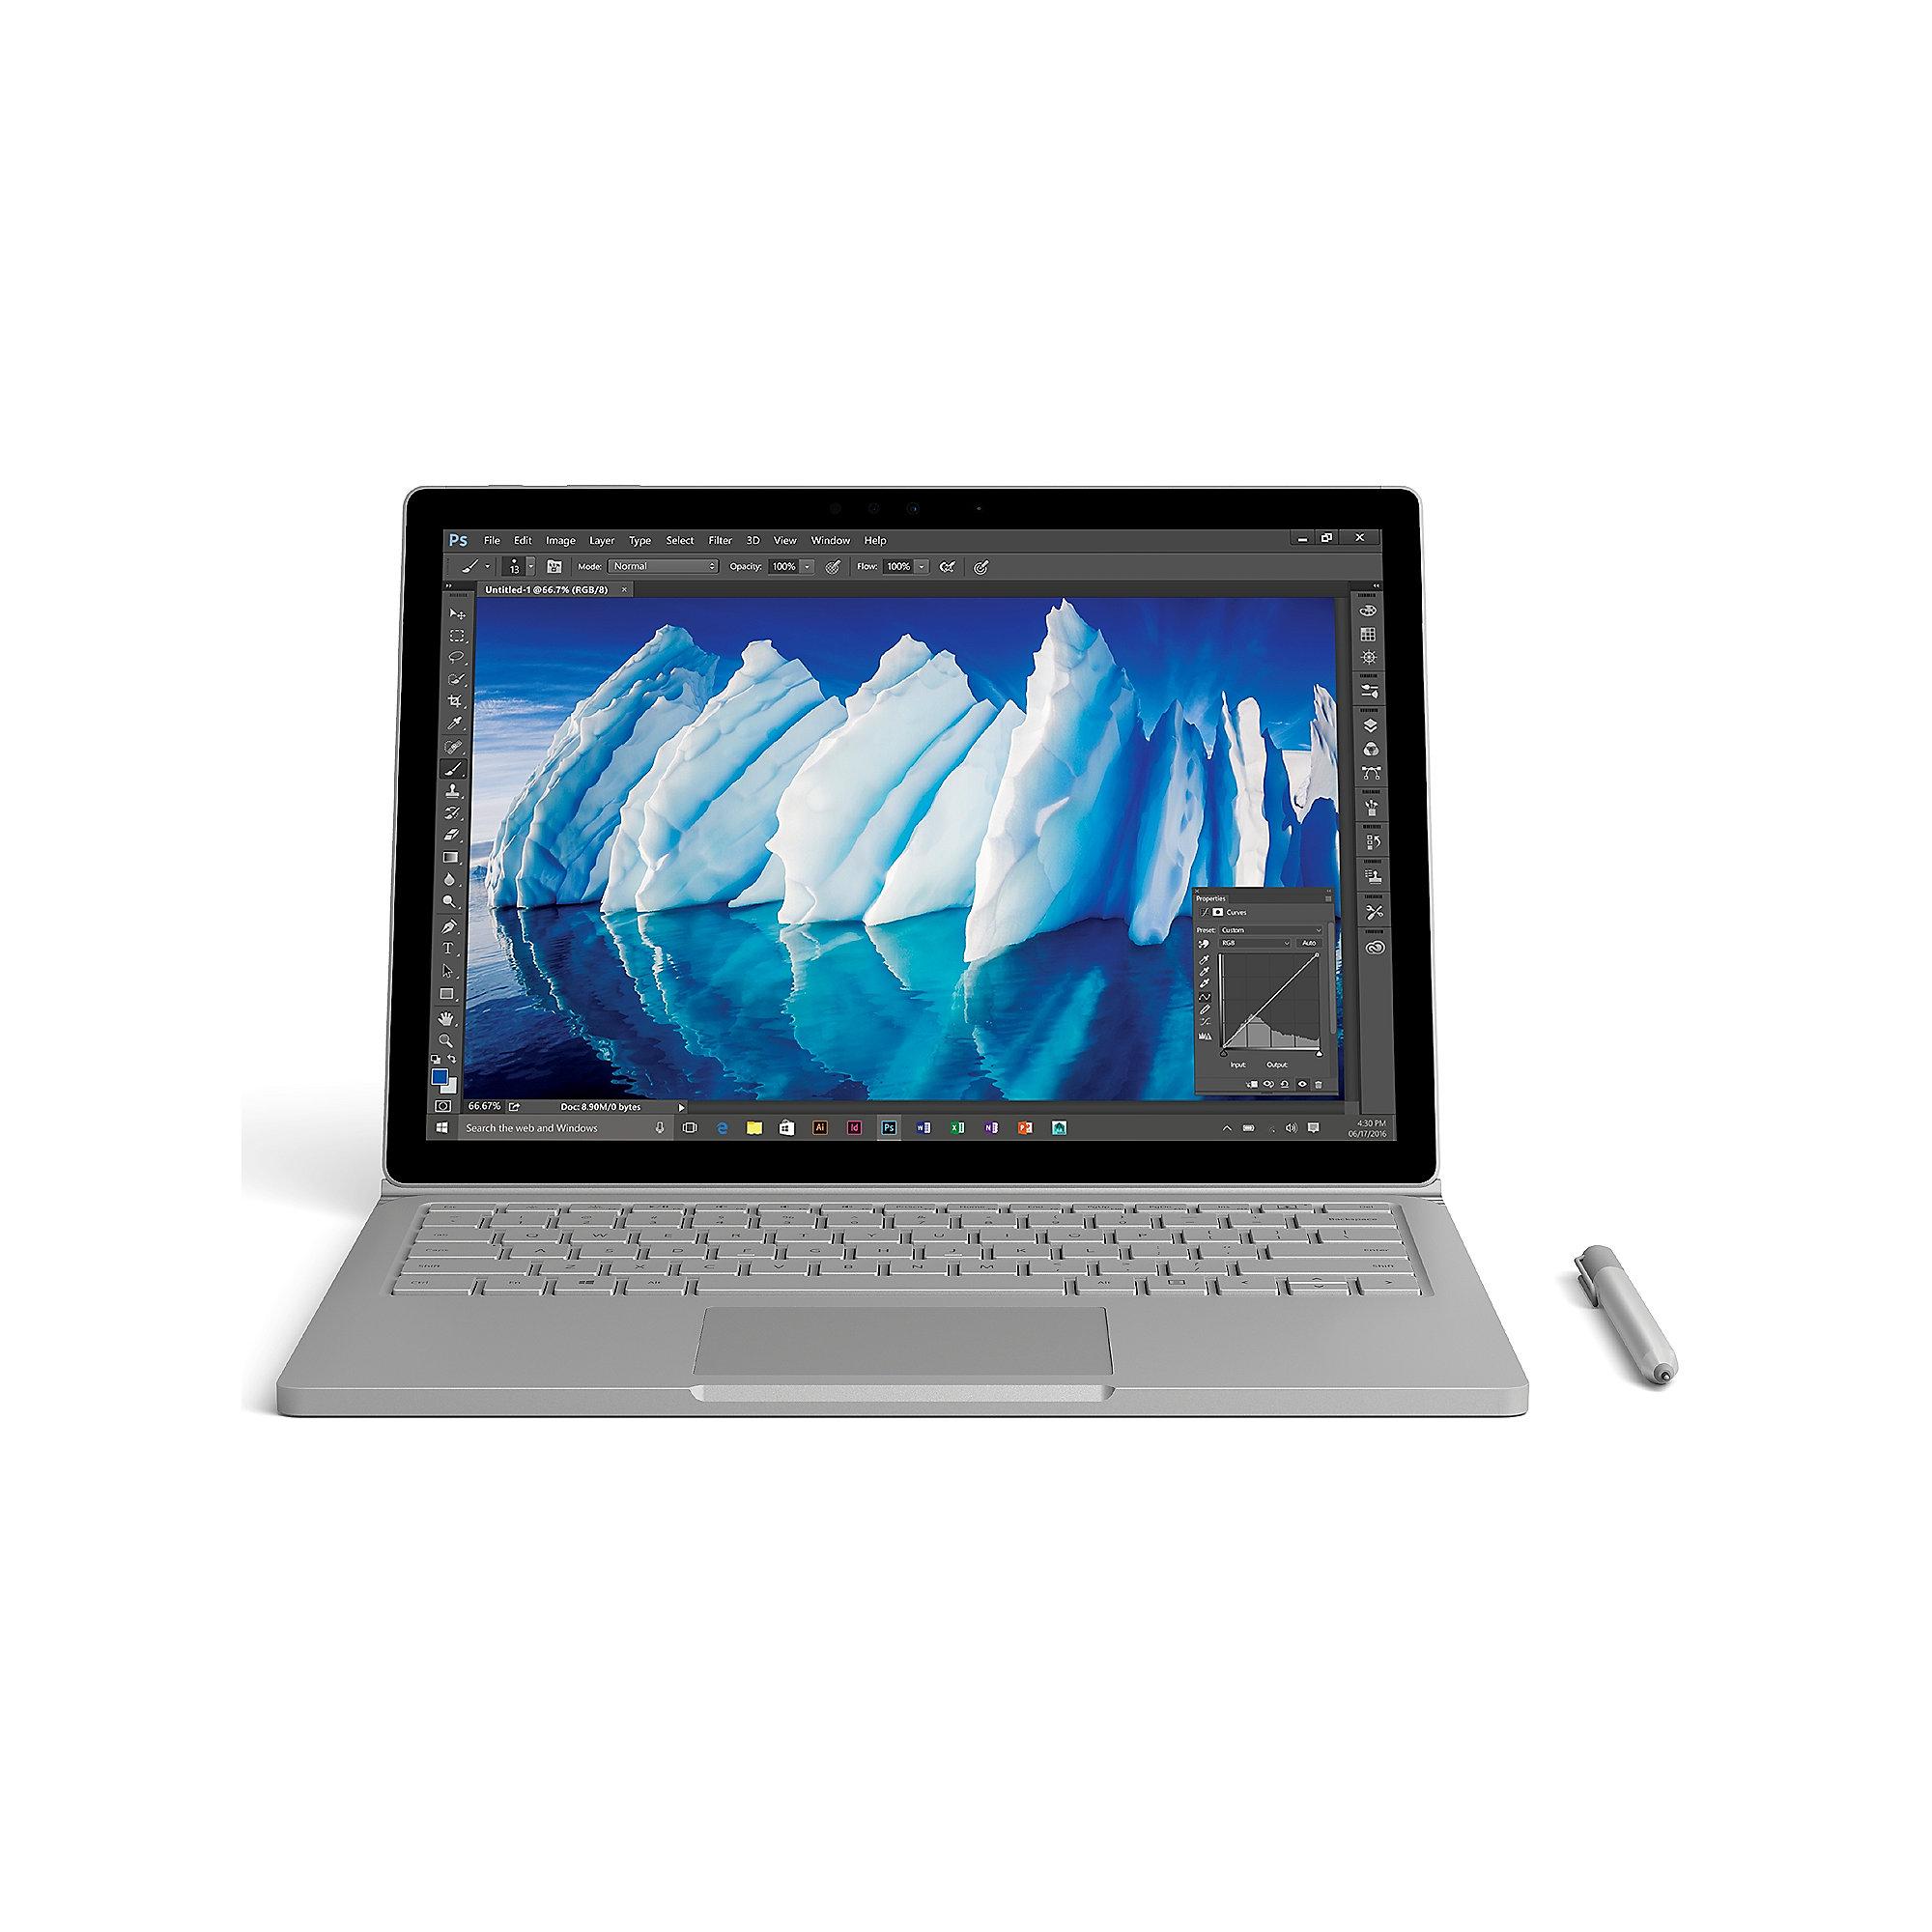 Microsoft Surface Book mit Performance Base (i7-6600U, GTX 965M) für 1192,95€ [Cyberport + Amazon]